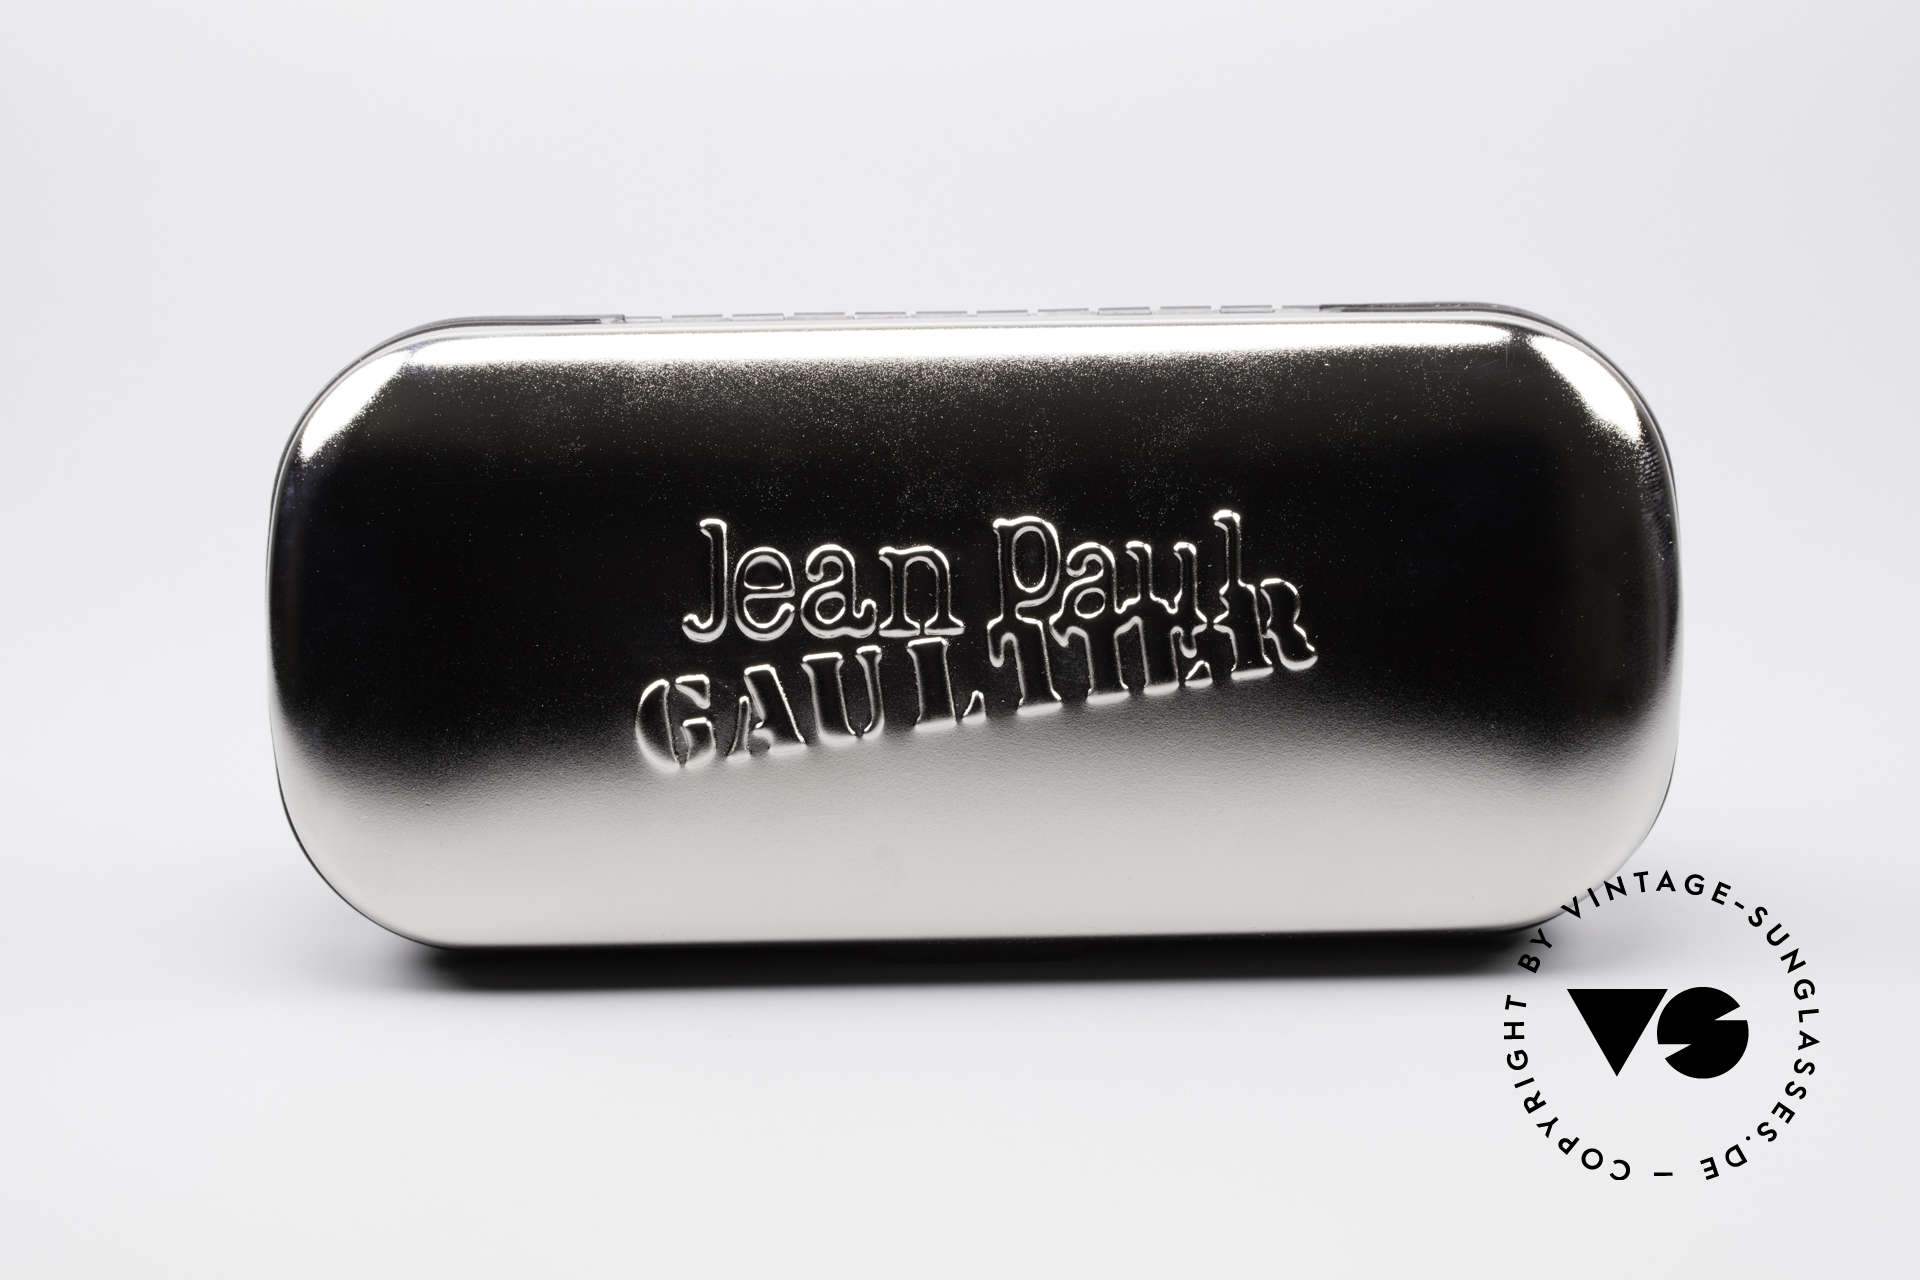 Jean Paul Gaultier 58-6102 Steampunk Designer Shades, Size: medium, Made for Men and Women